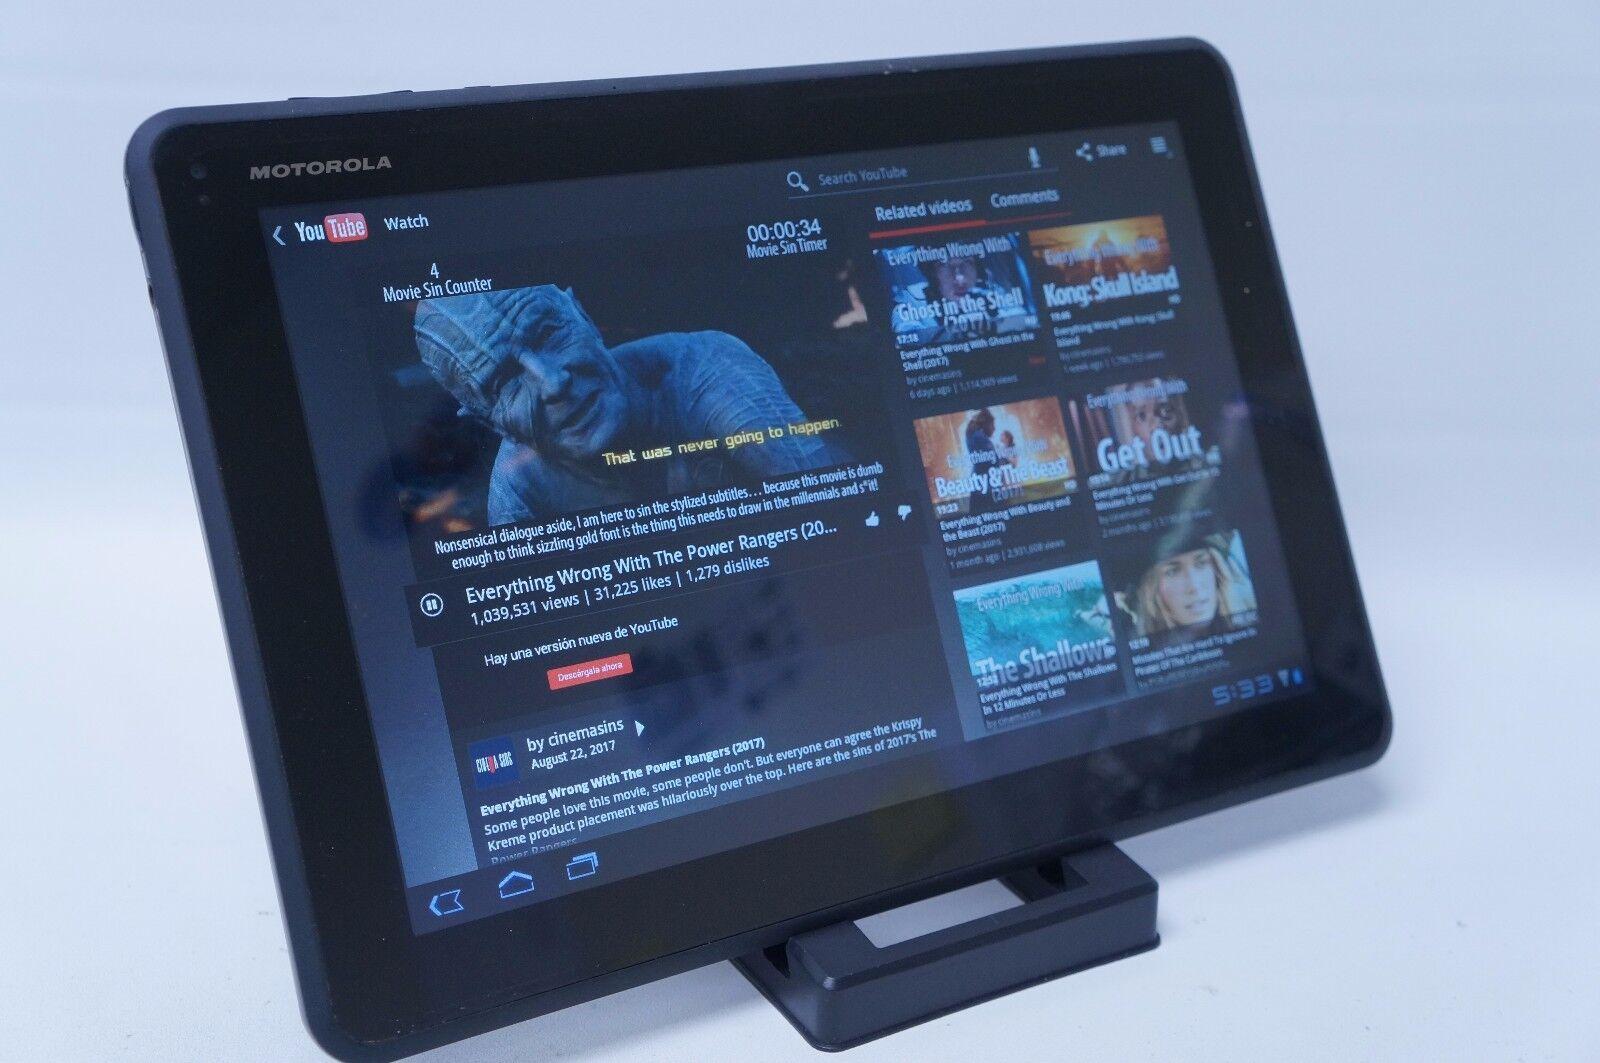 Motorola XOOM Media Edition MZ505 16GB, Wi-Fi, 10.1in - *DEFECTIVE ITEM*